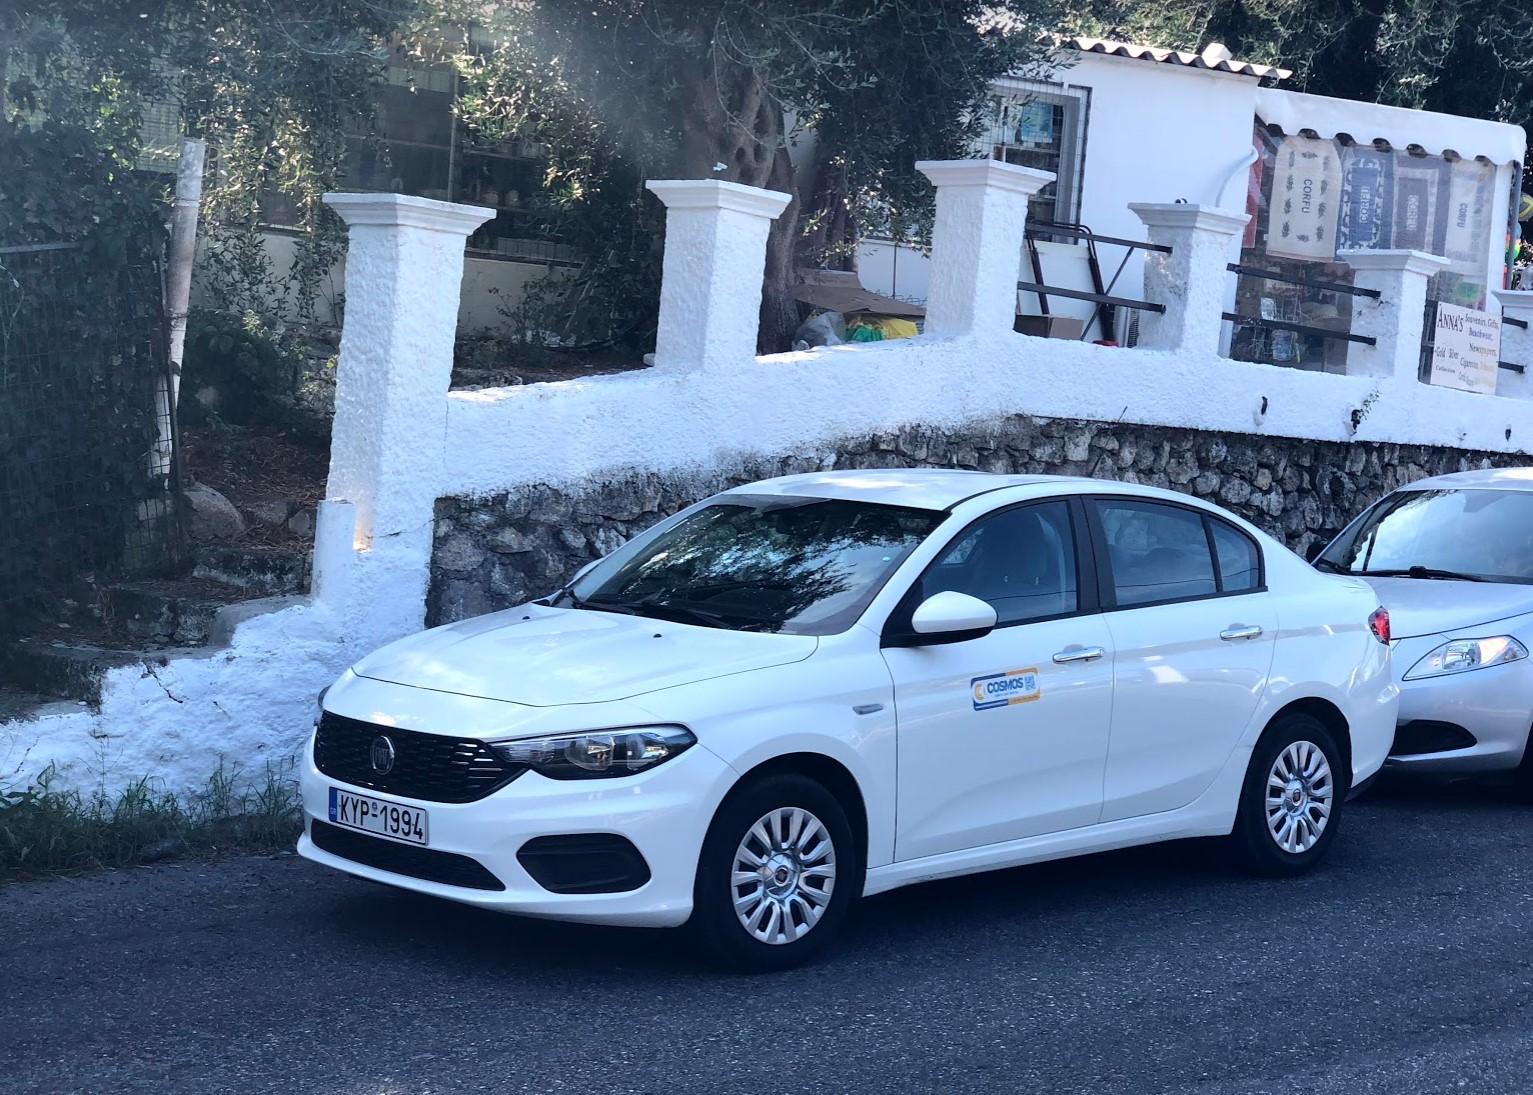 Corfu Car Rental